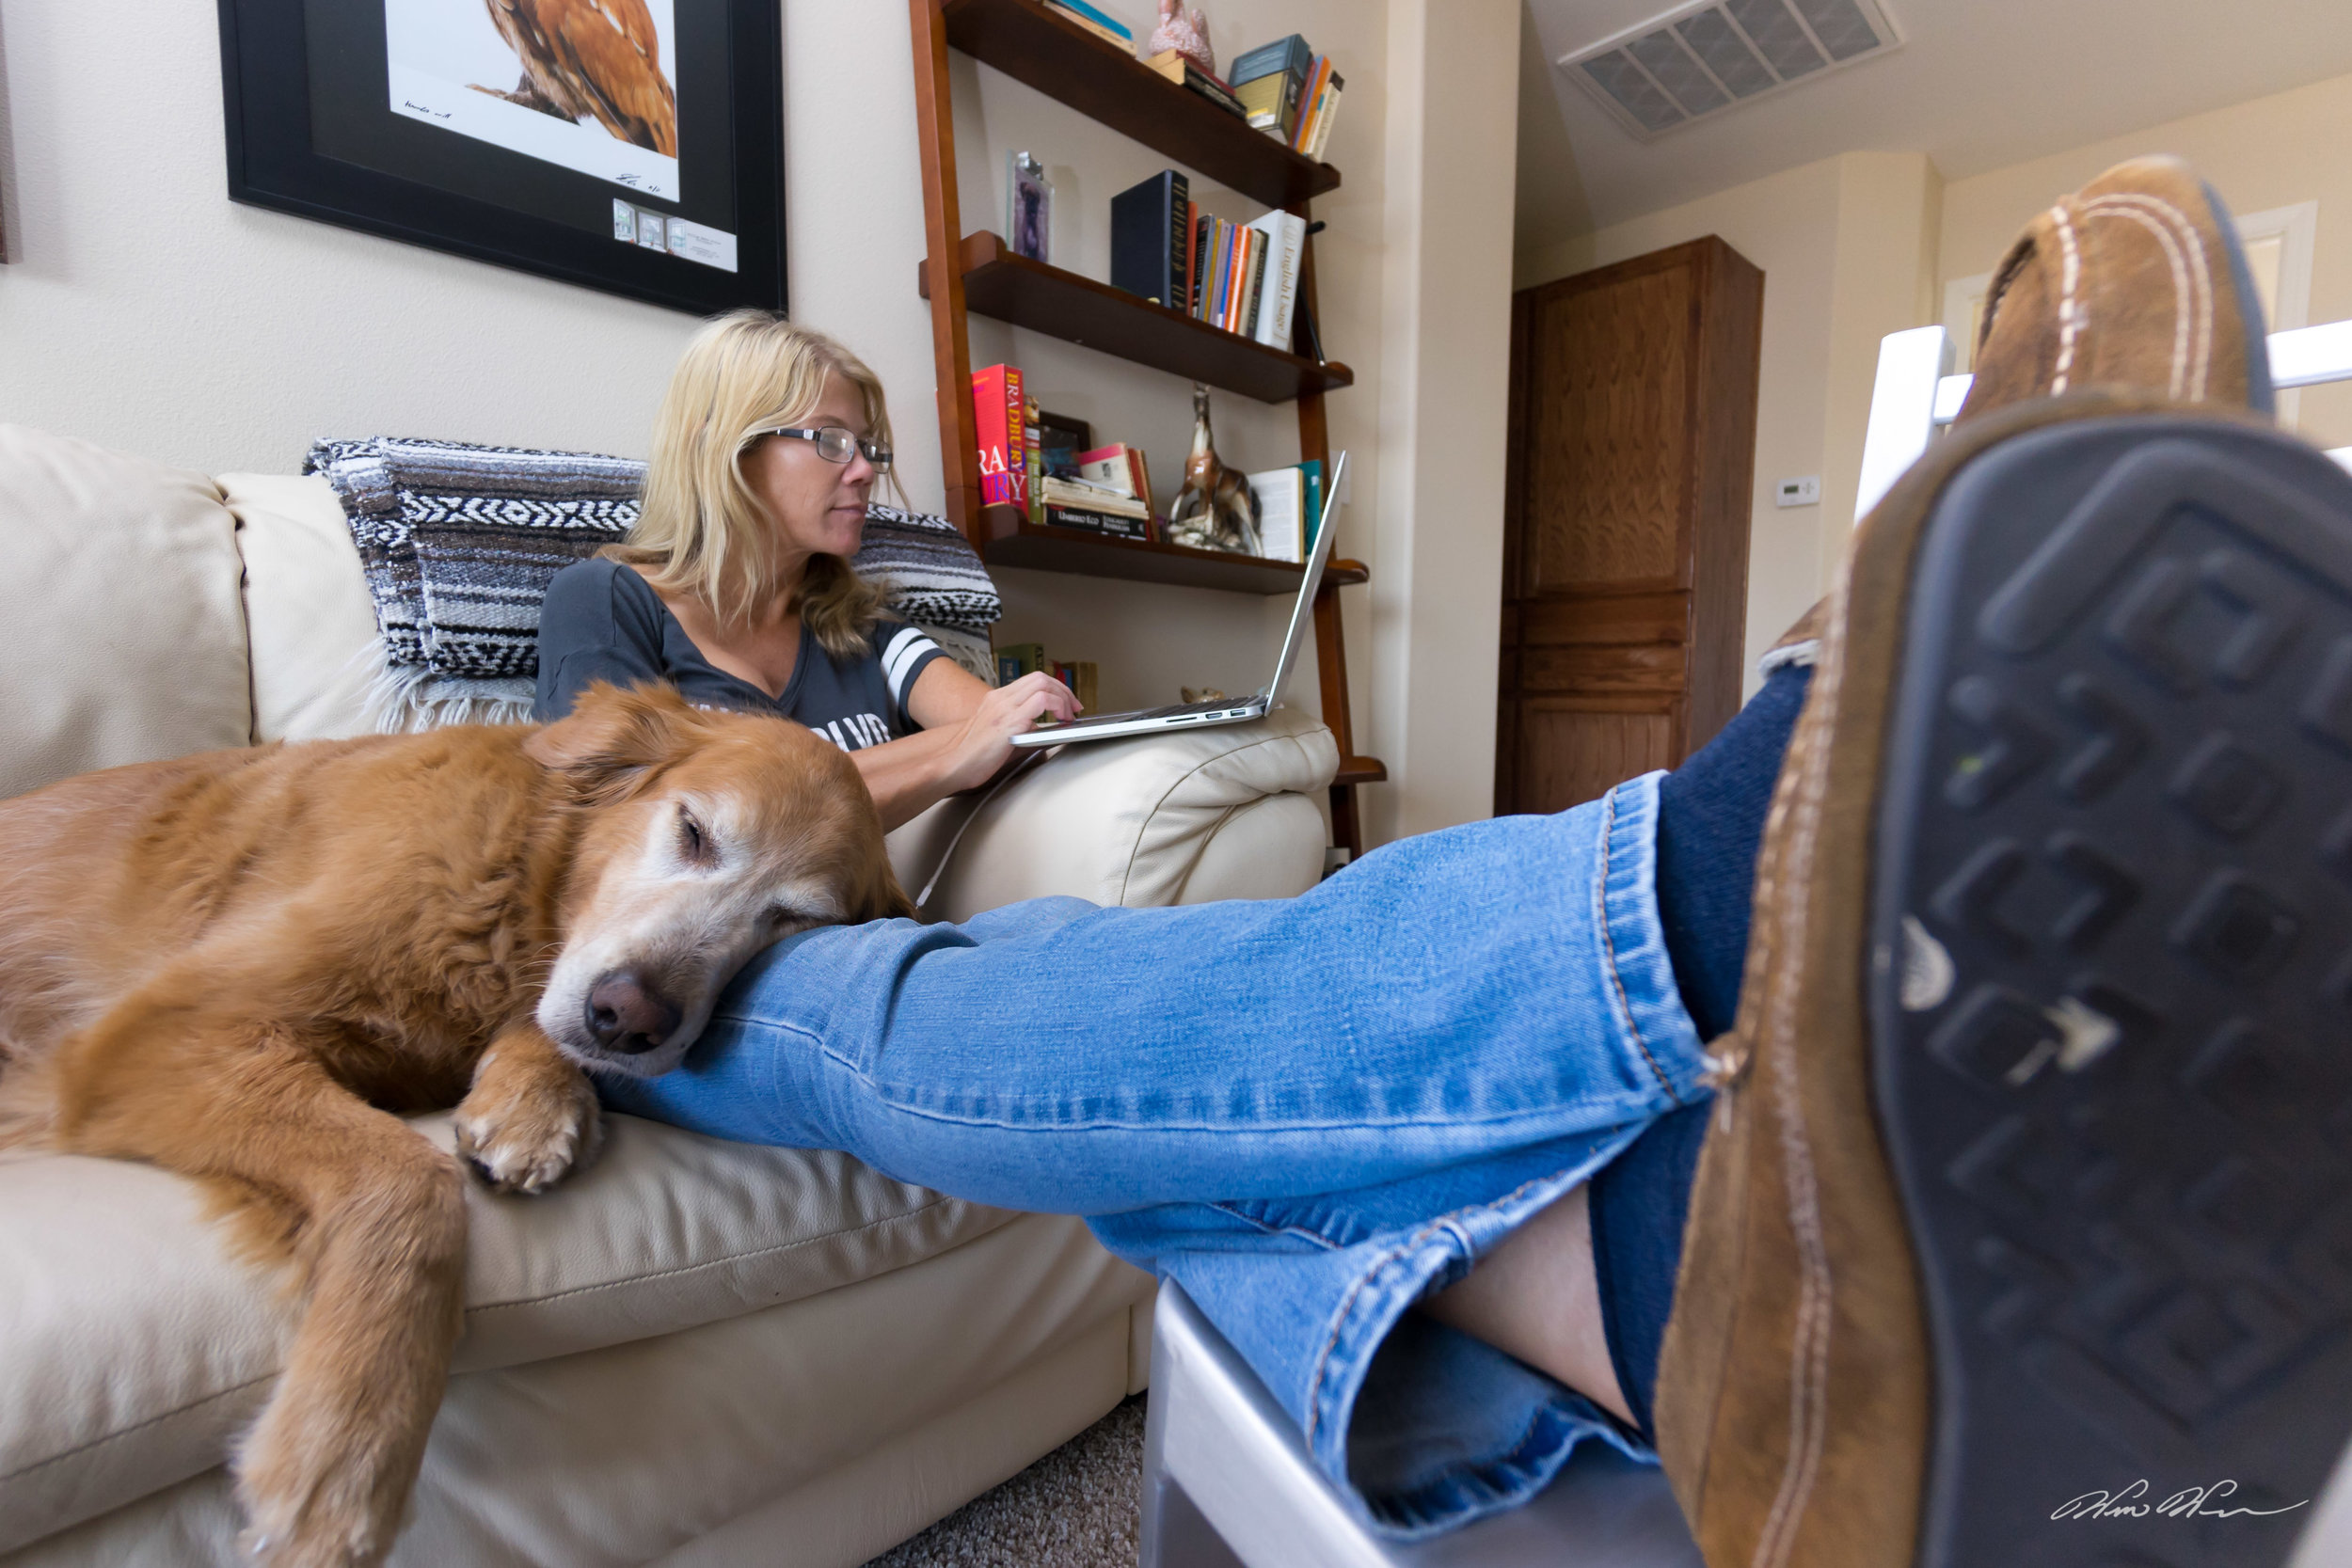 Simon the Golden Retriever naps while Tara the wife shops